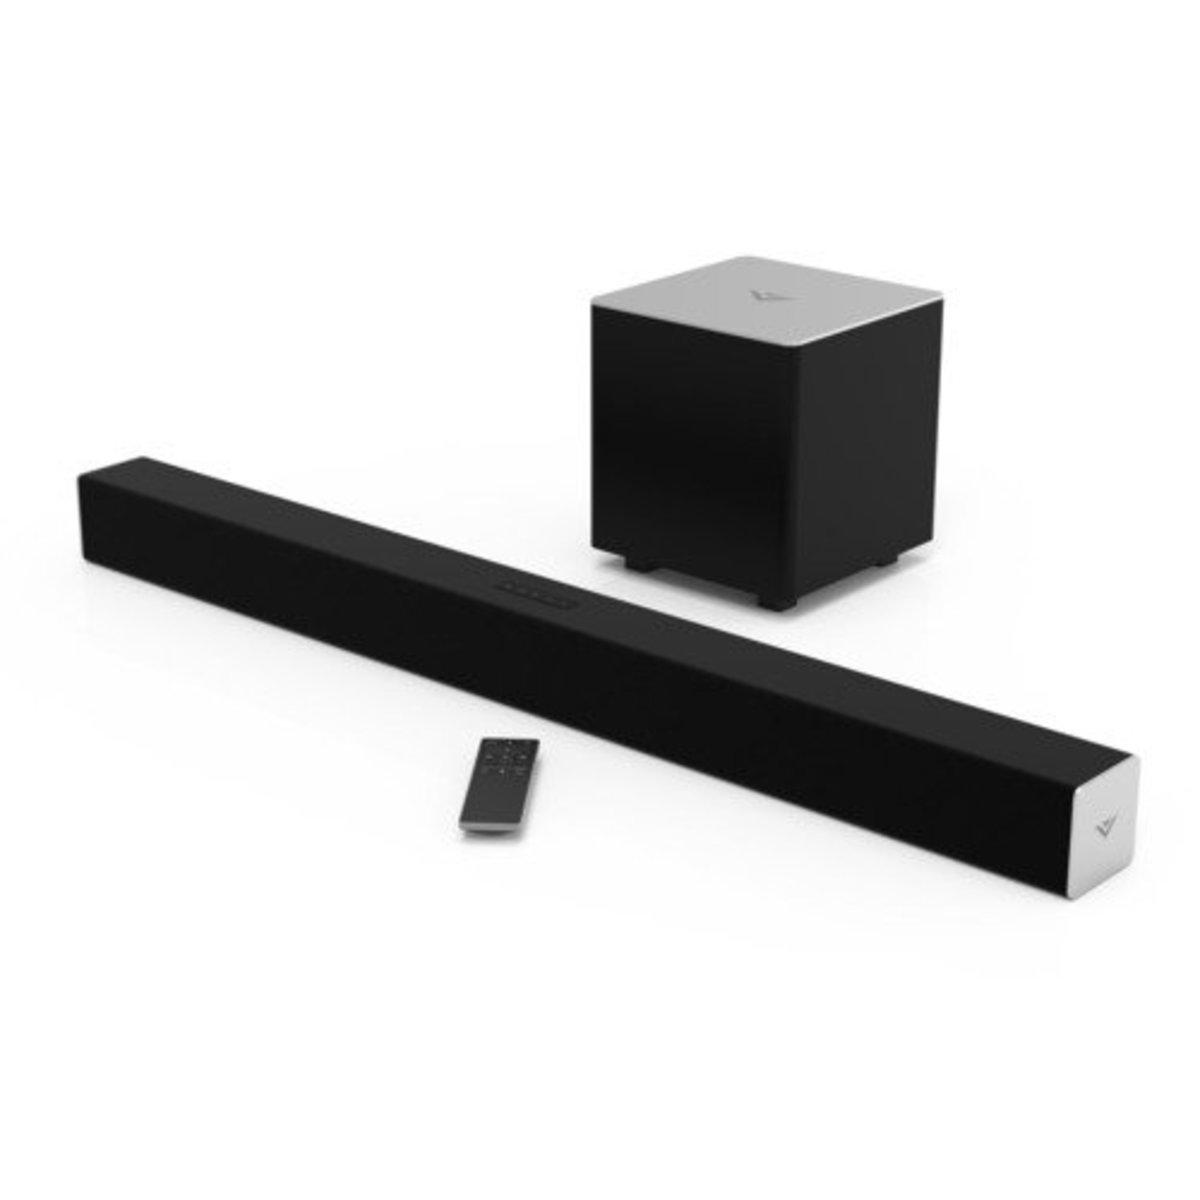 VIZIO SB3821-C6 - best soundbar under $200